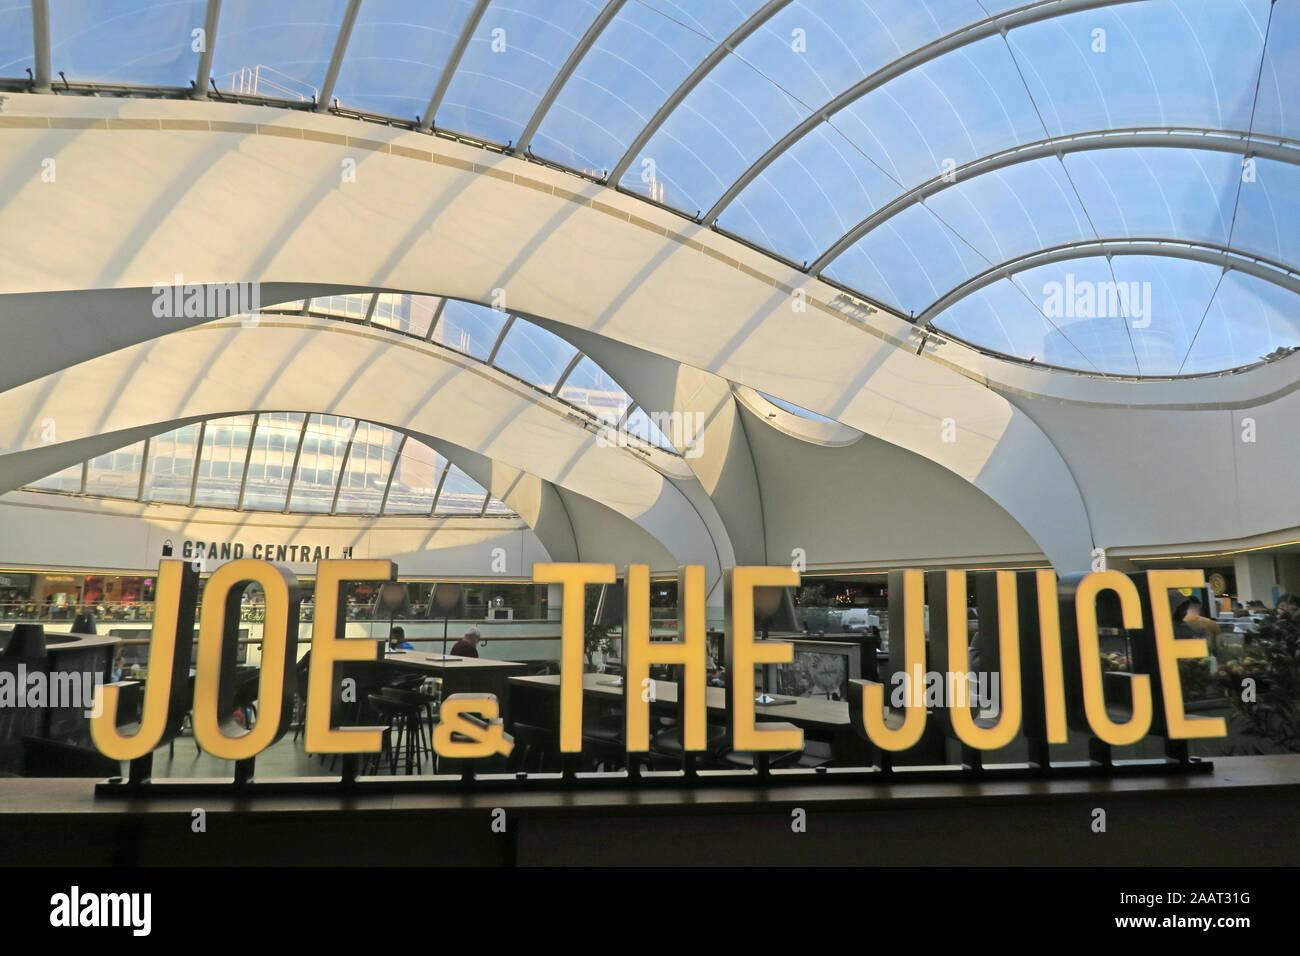 HotpixUk,@HotpixUK,GoTonySmith,UK,England,English,West Midlands,city Centre,B2,New Street Railway Station,central hub of UK rail network,B2 4QA,Redeveloped,developed,Grand Central,New St Railway Station,Birmingham New St,interior,inside,Gateway Plus project,Foreign Office Architects,domed atrium,Grand Central shopping centre,shopping centre,rail network,network rail,Joe and the Juice,outlet,veggie shots,organic ingredients,Valedo Partners